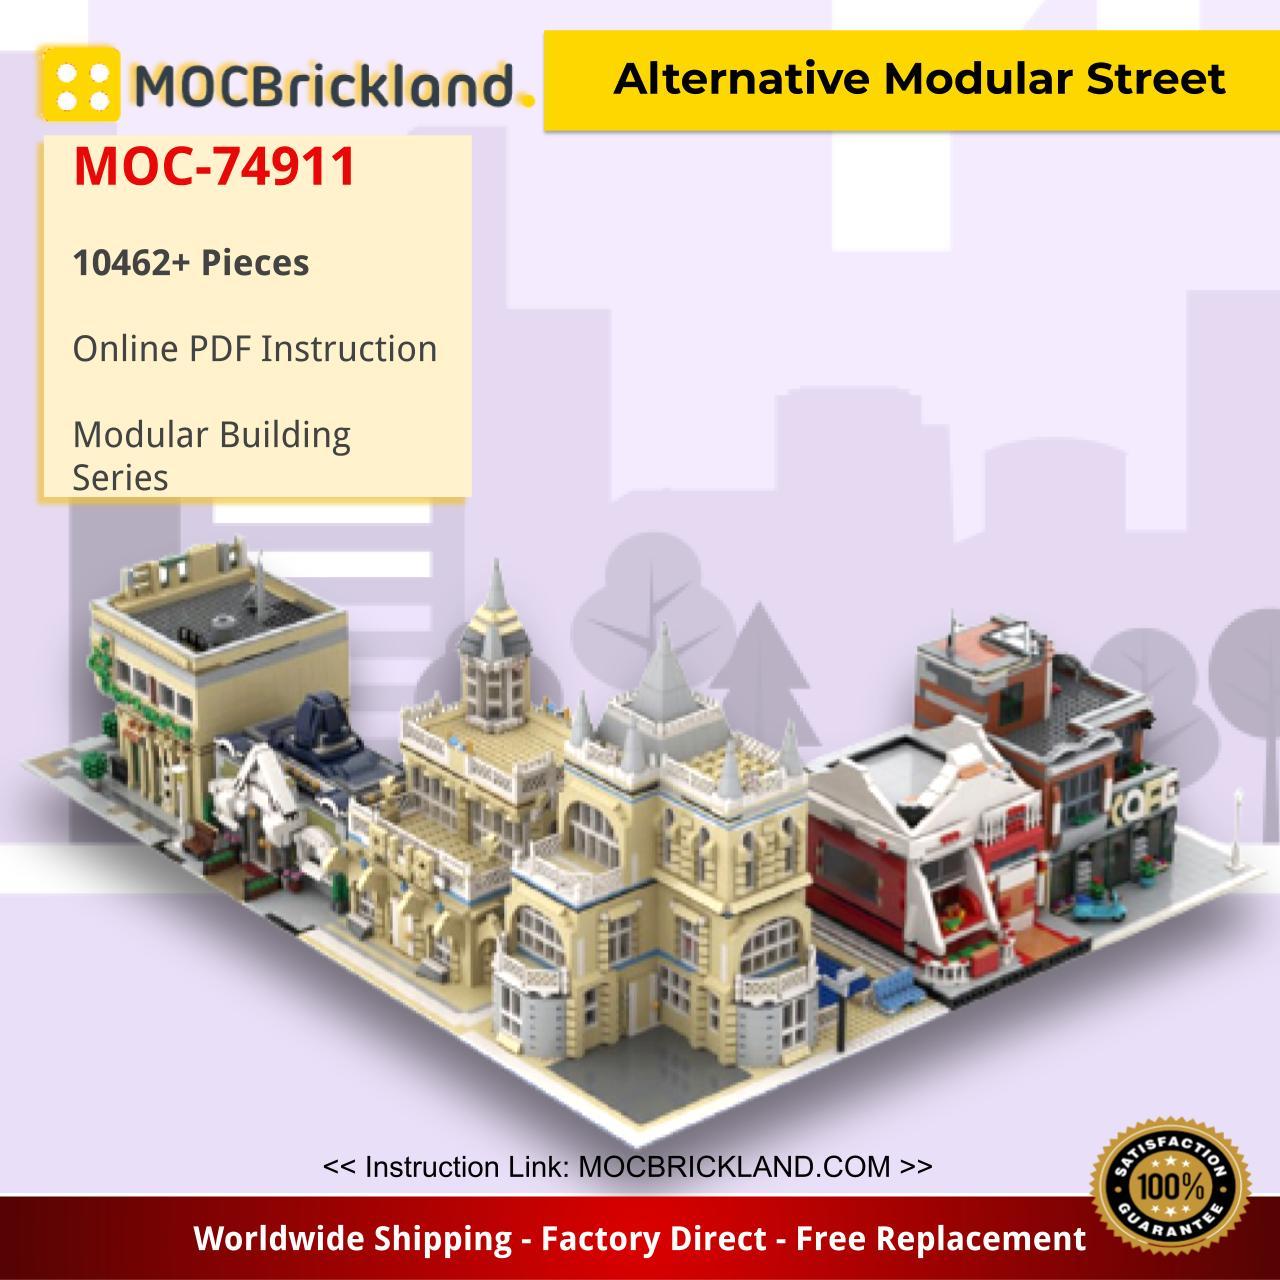 Alternative Modular Street Modular Building MOC-74911 by gabizon WITH 10462 PIECES